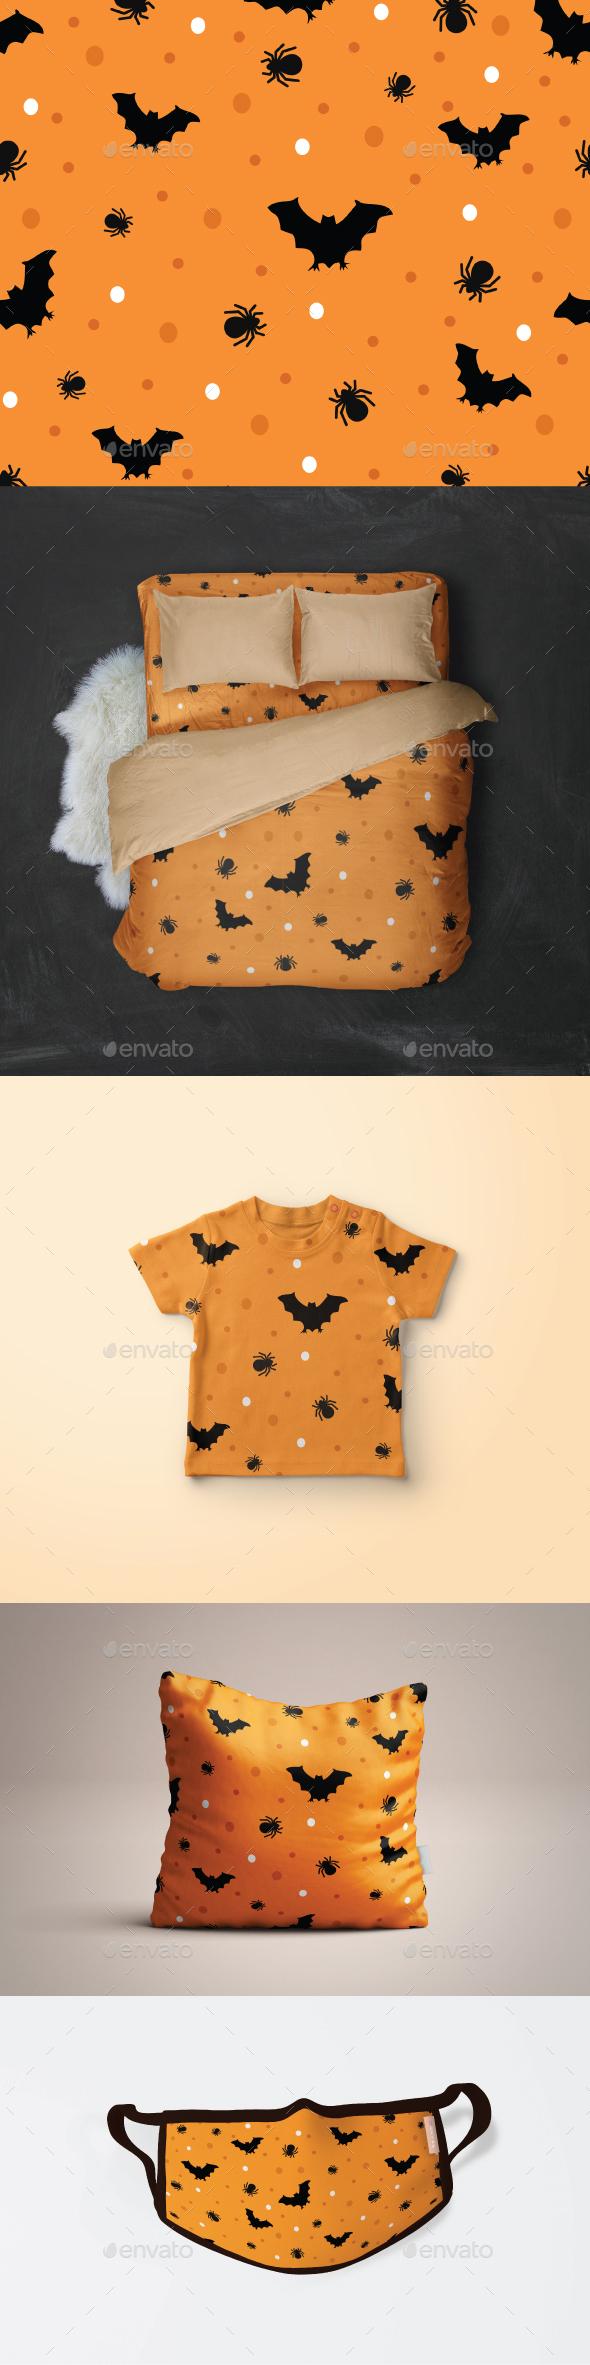 Seamless Halloween Bat and Spider Pattern